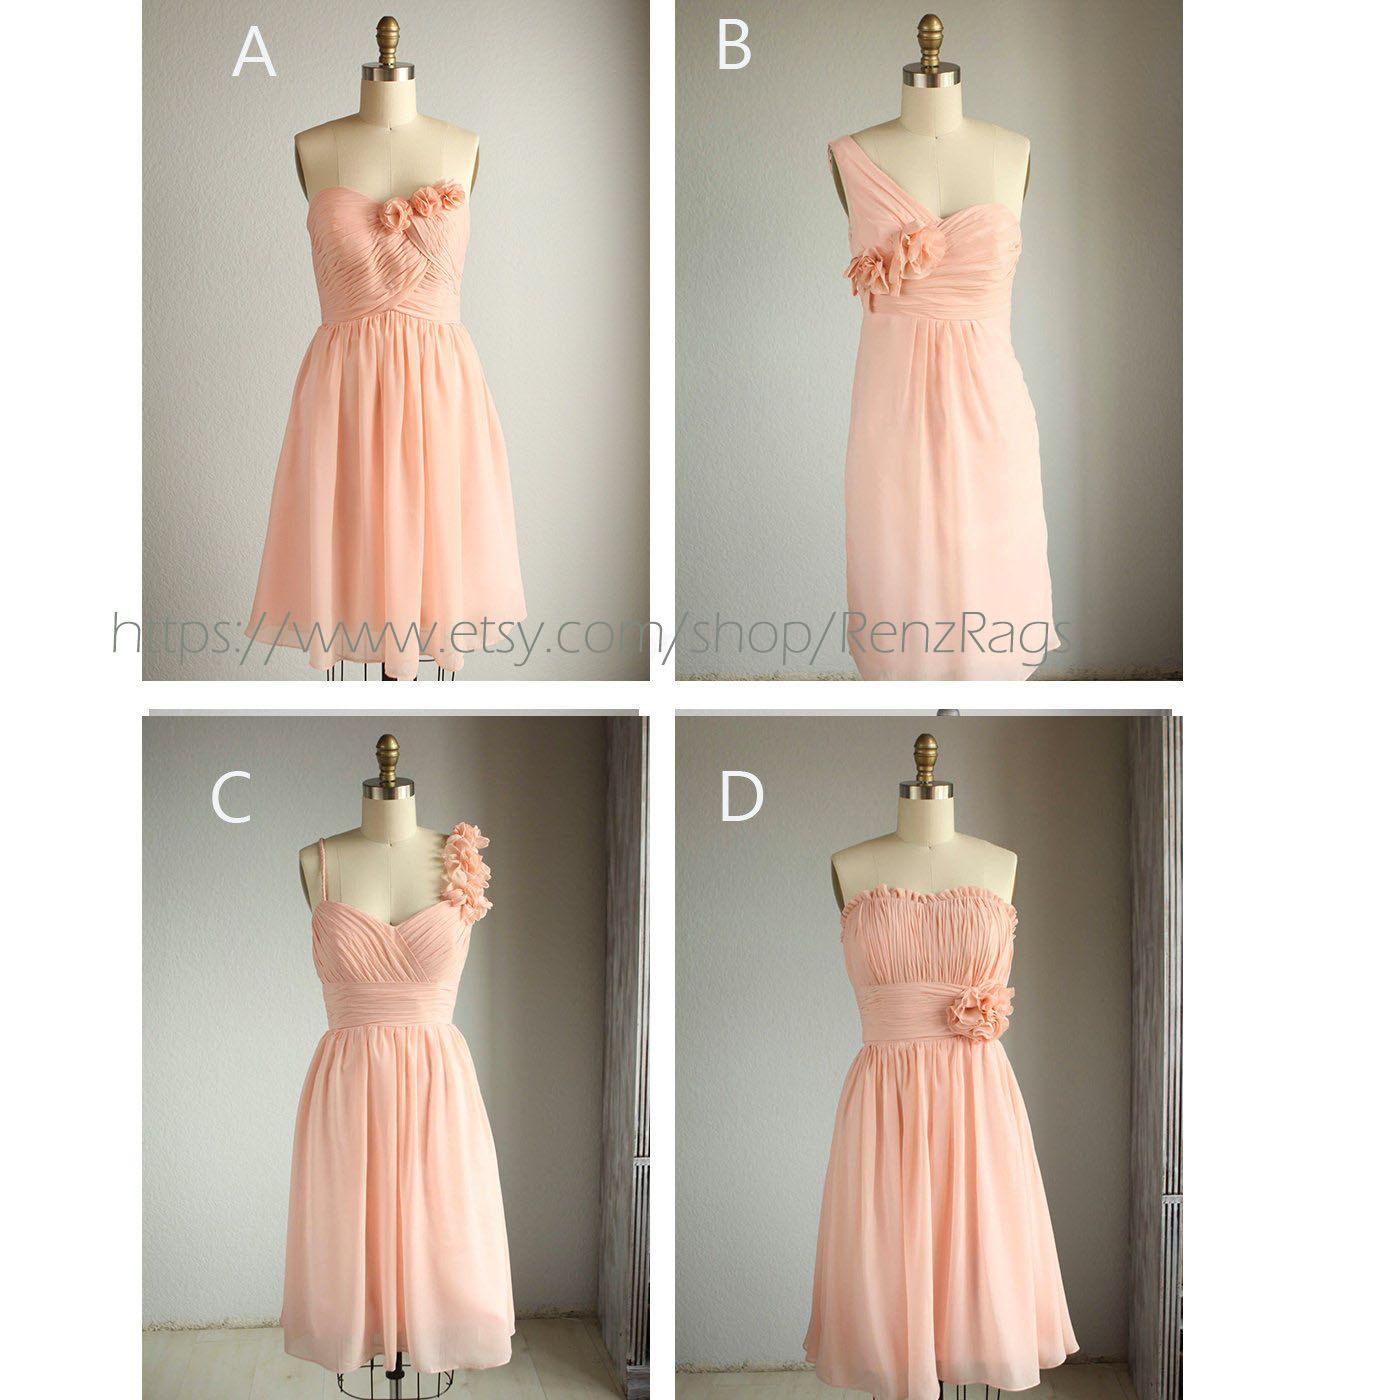 Mix match bridesmaid dresses romantic peach color by renzrags mix match bridesmaid dresses romantic peach color by renzrags 9900 ombrellifo Images